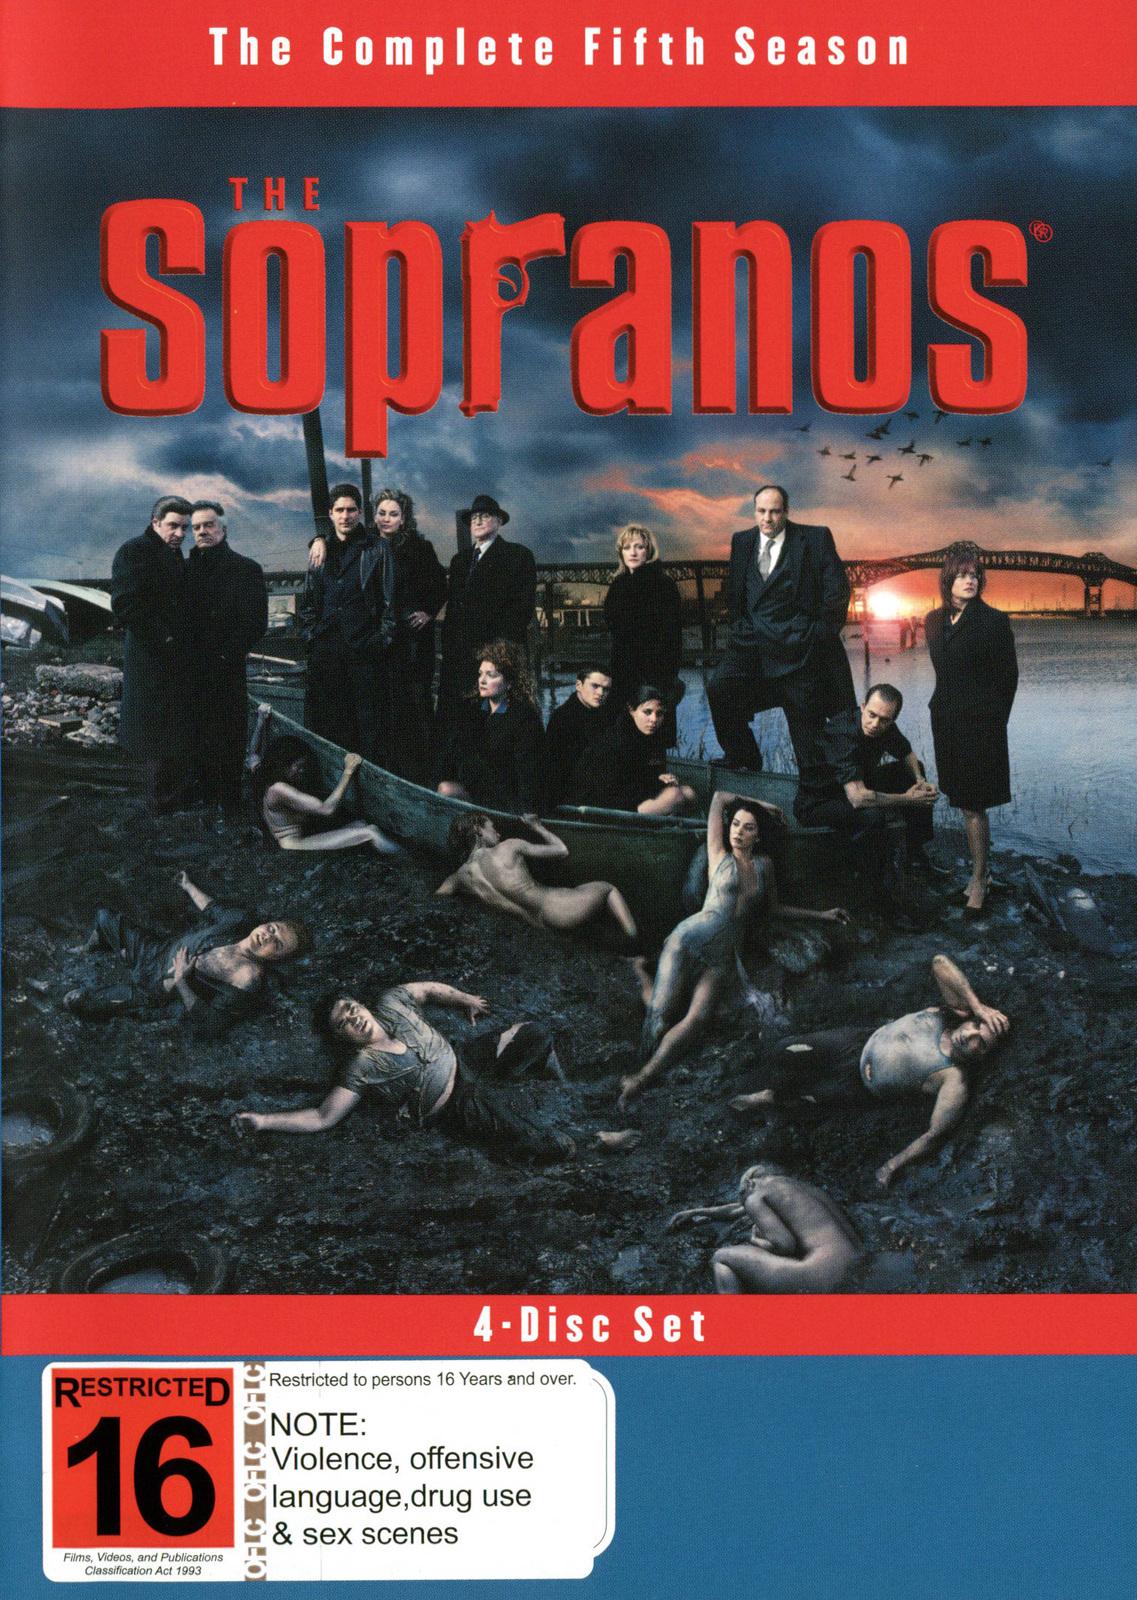 The Sopranos - Season 5 on DVD image